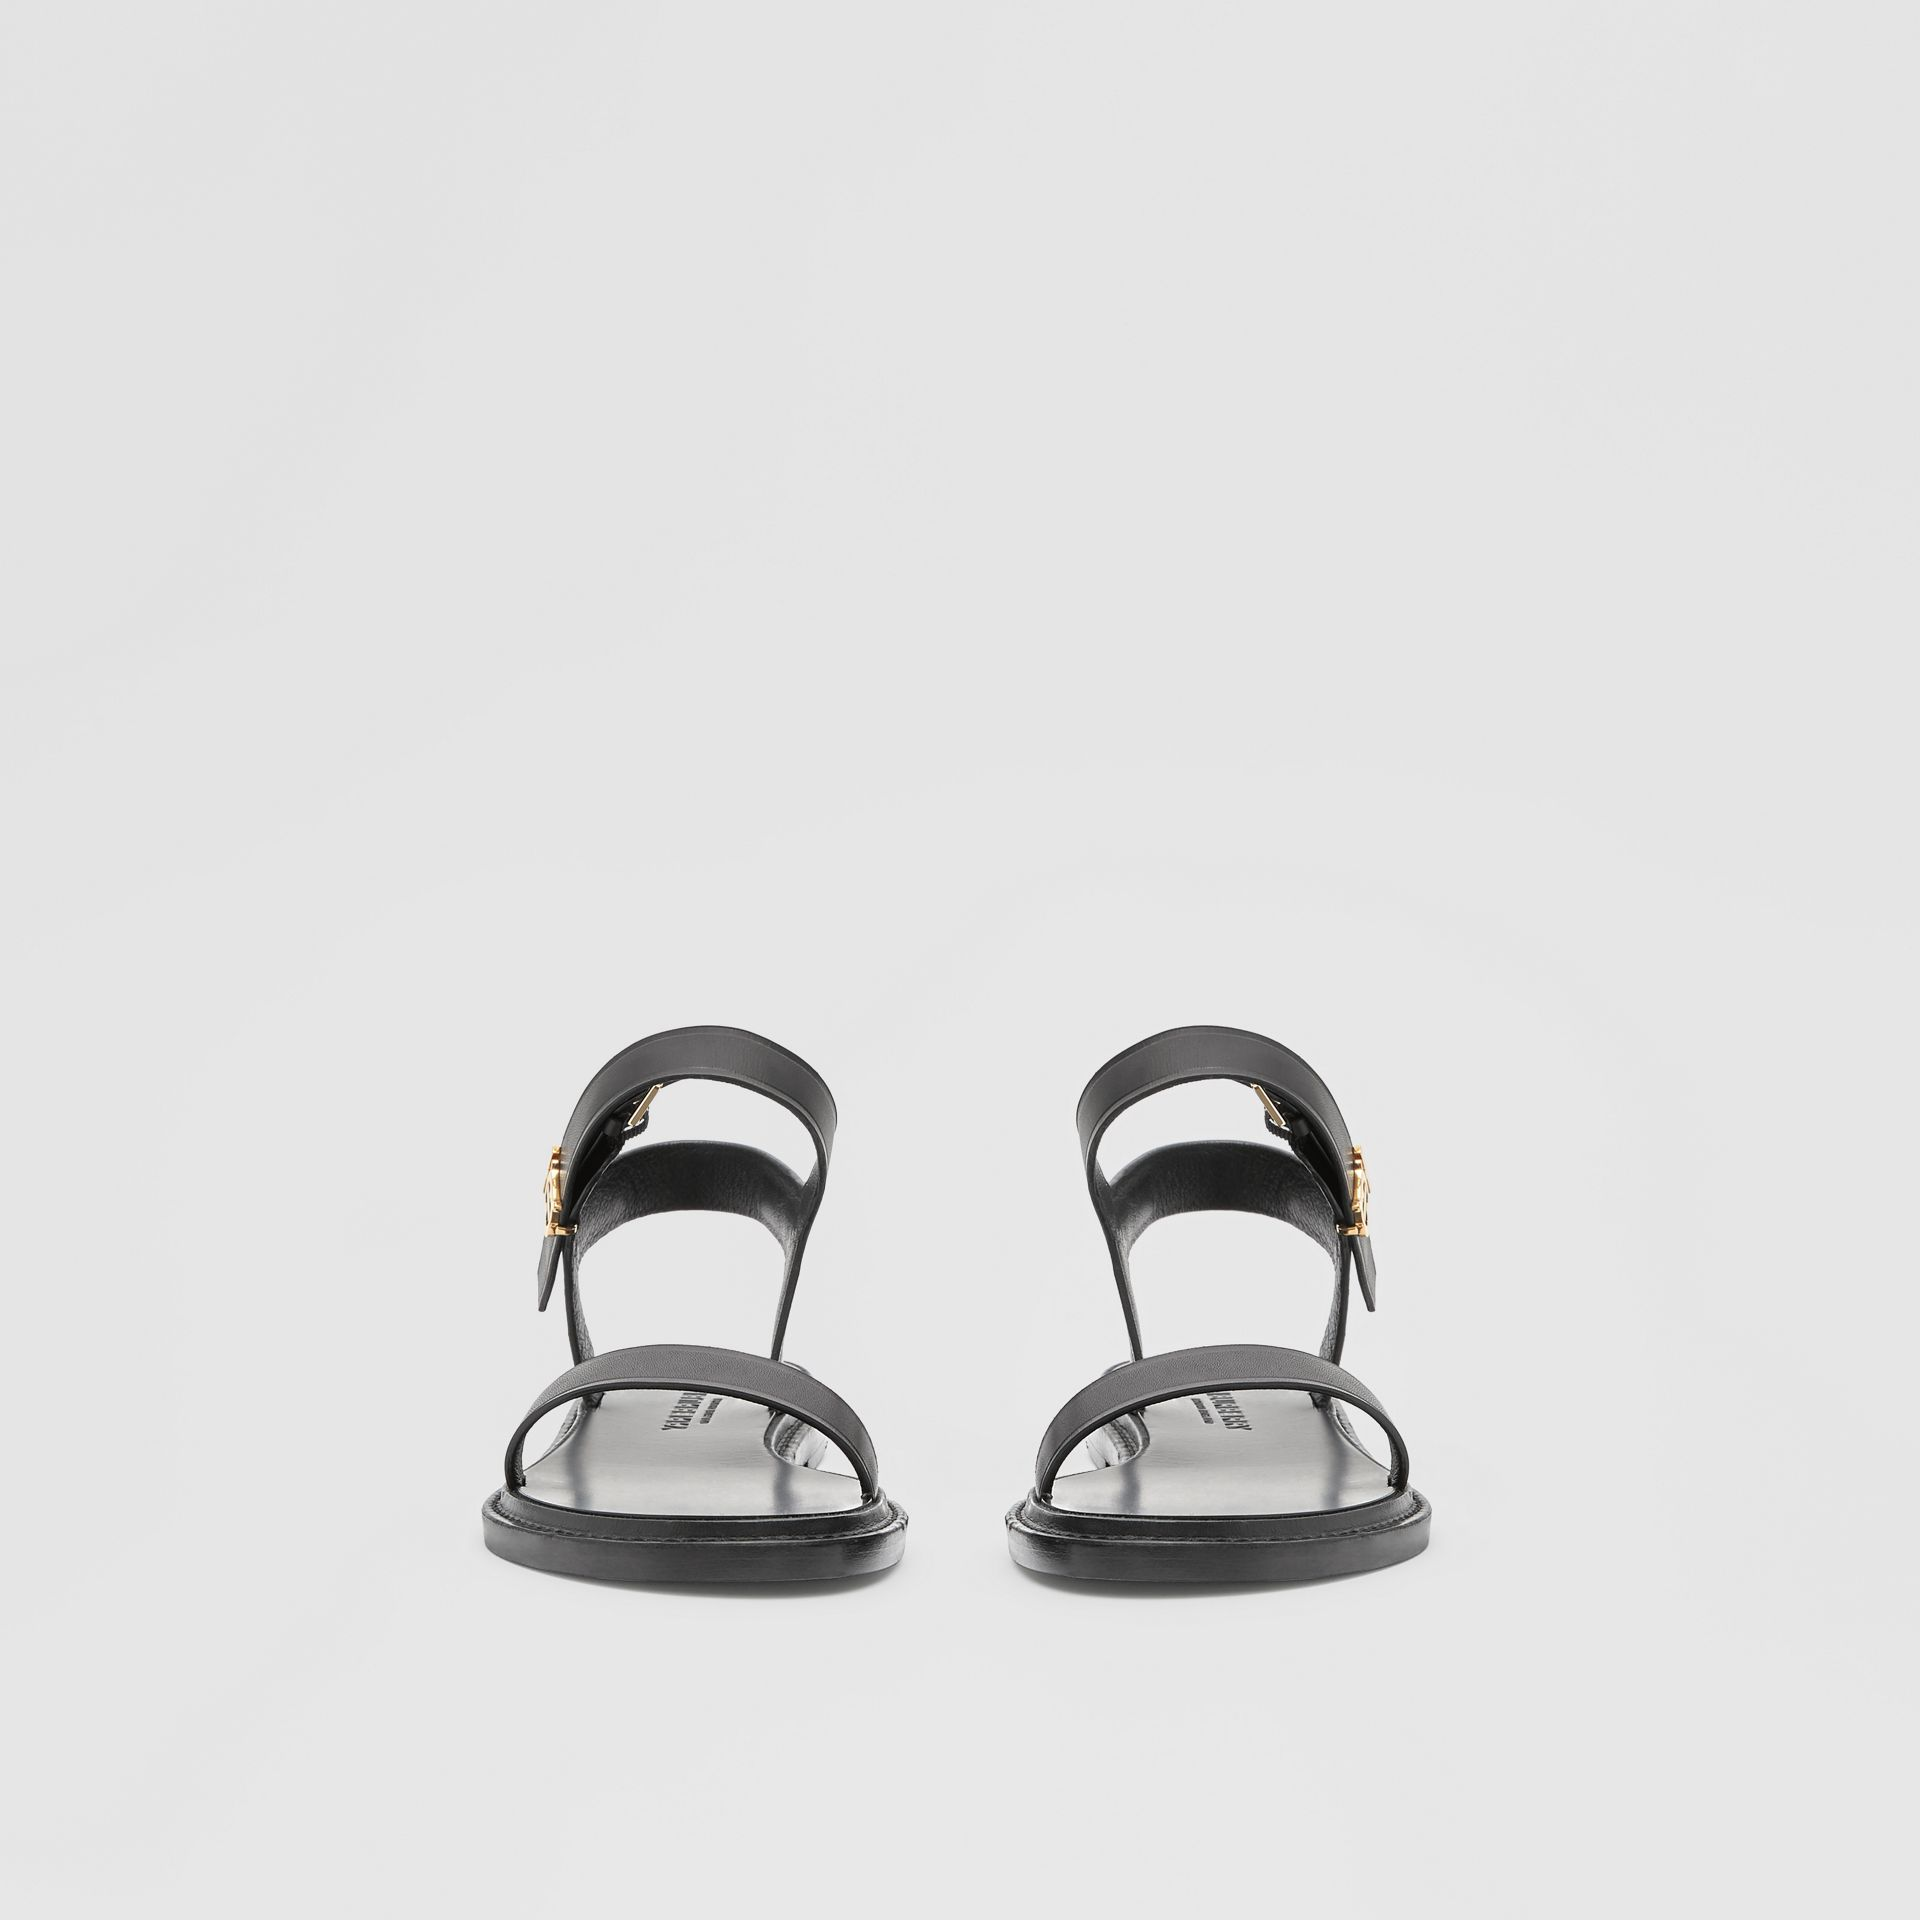 Monogram Motif Leather Sandals in Black - Women | Burberry United Kingdom - gallery image 2